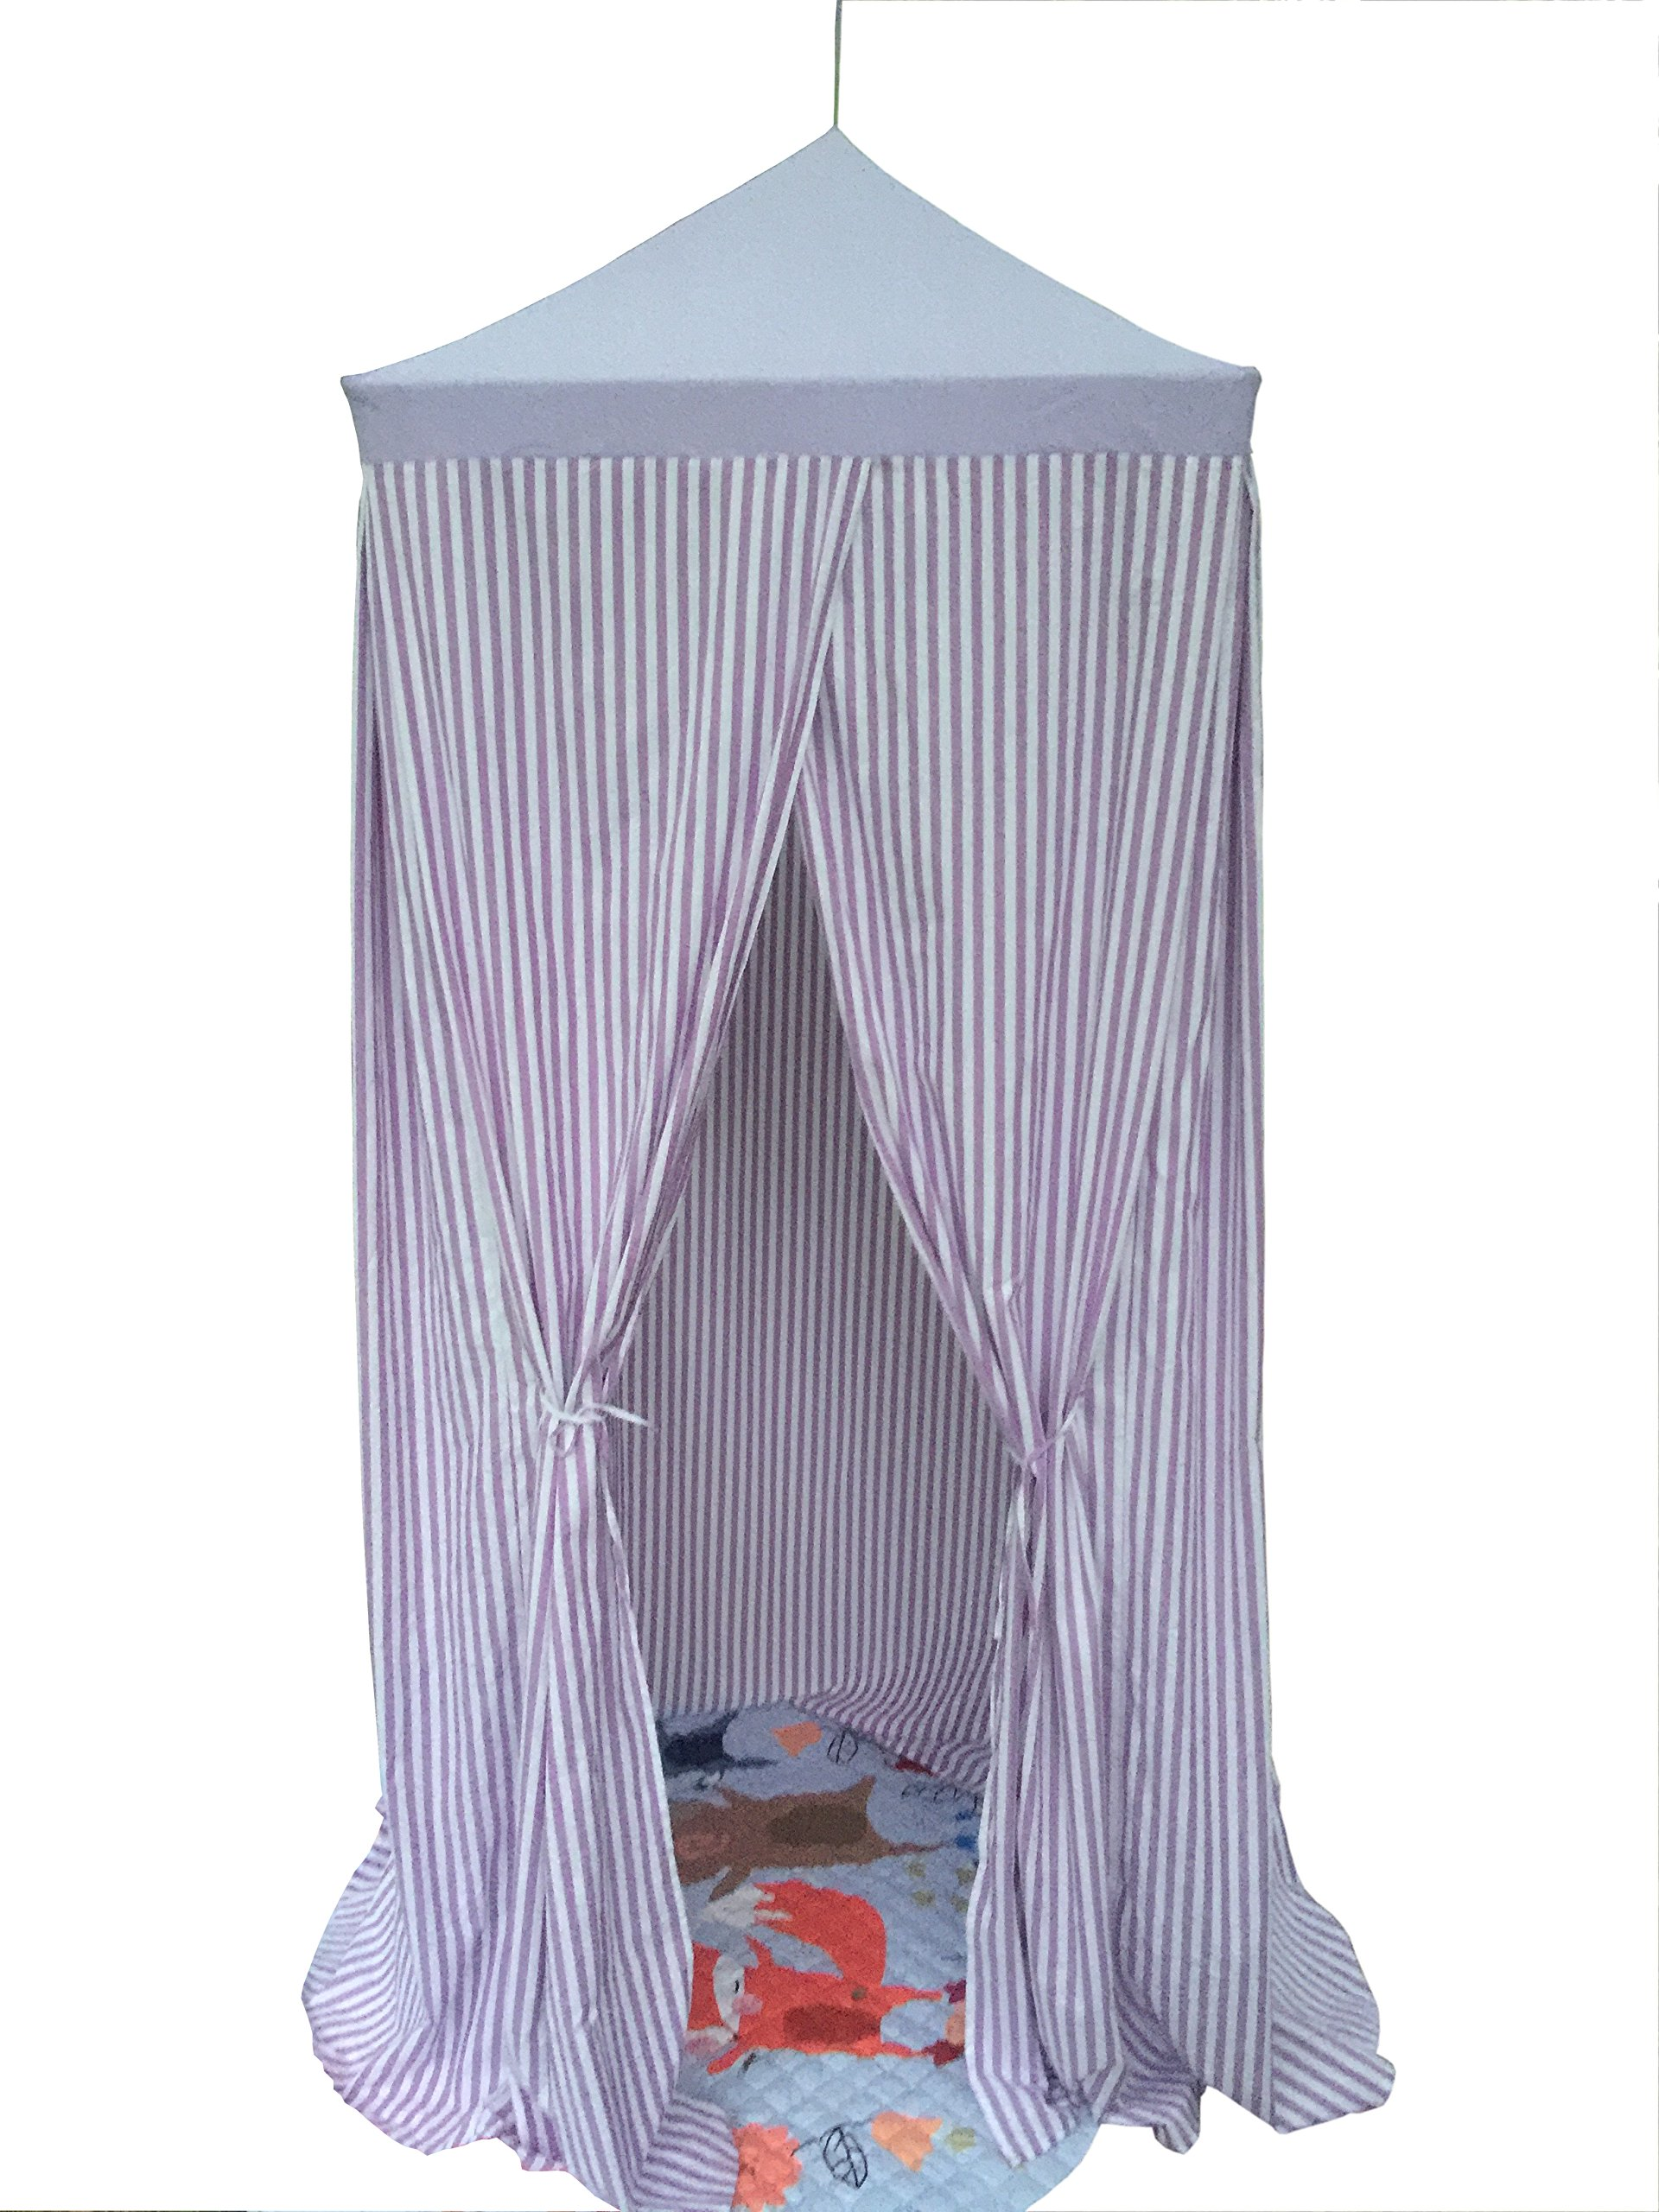 Pericross 7'9'' Square Baldachin Kids Reading Play Tent with Dual Windows (Purple Stripes)